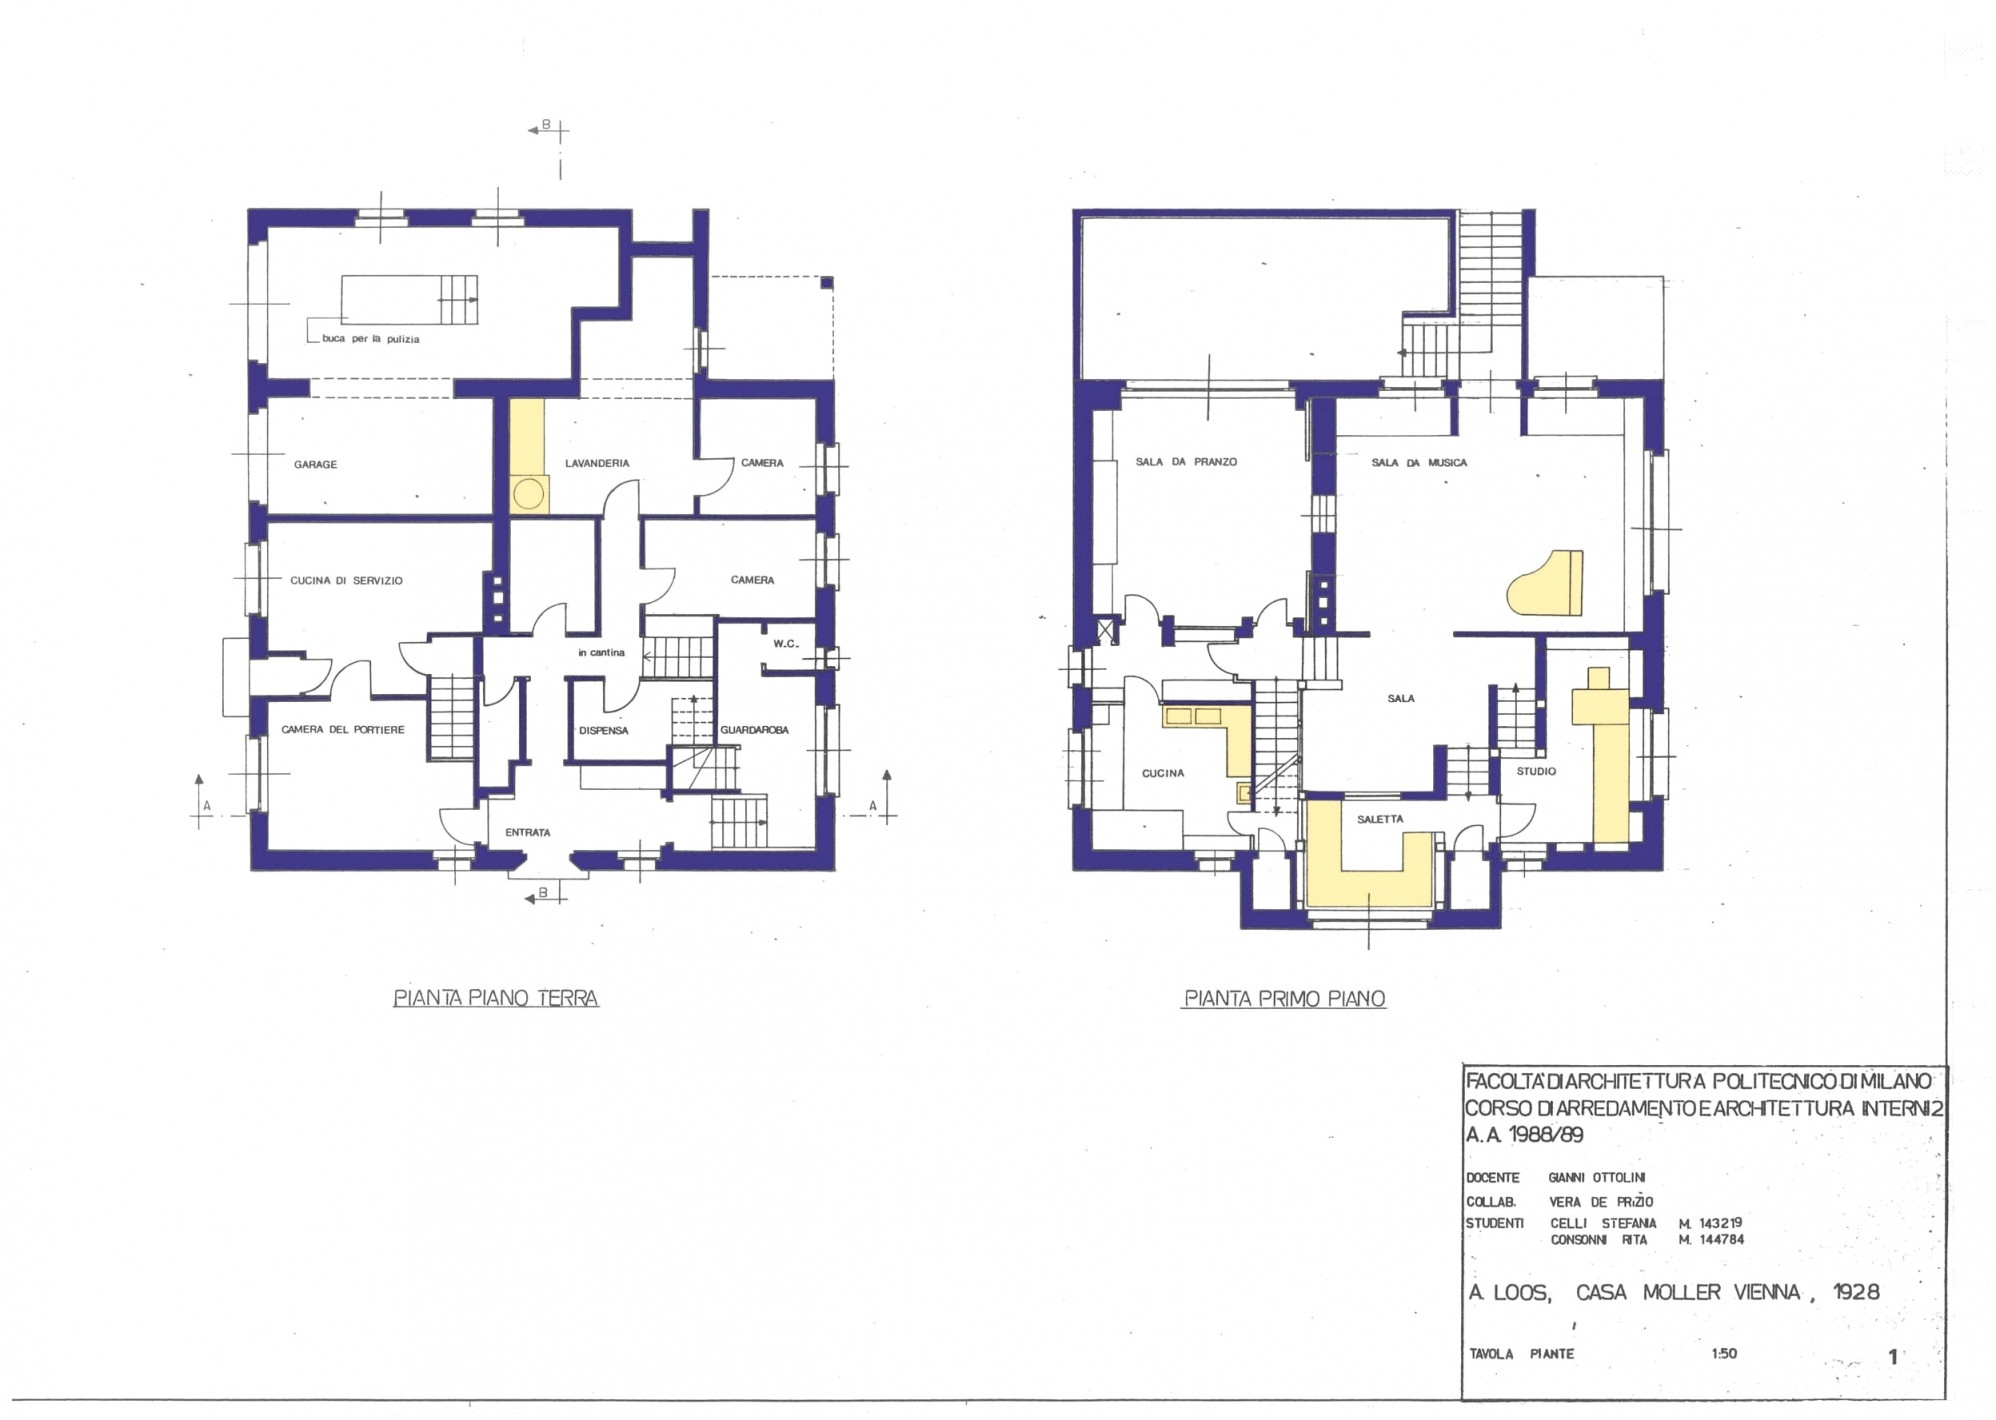 kitchen floor plan dimensions beautiful floor plan luxury awesome free floor plans unique design plan 0d